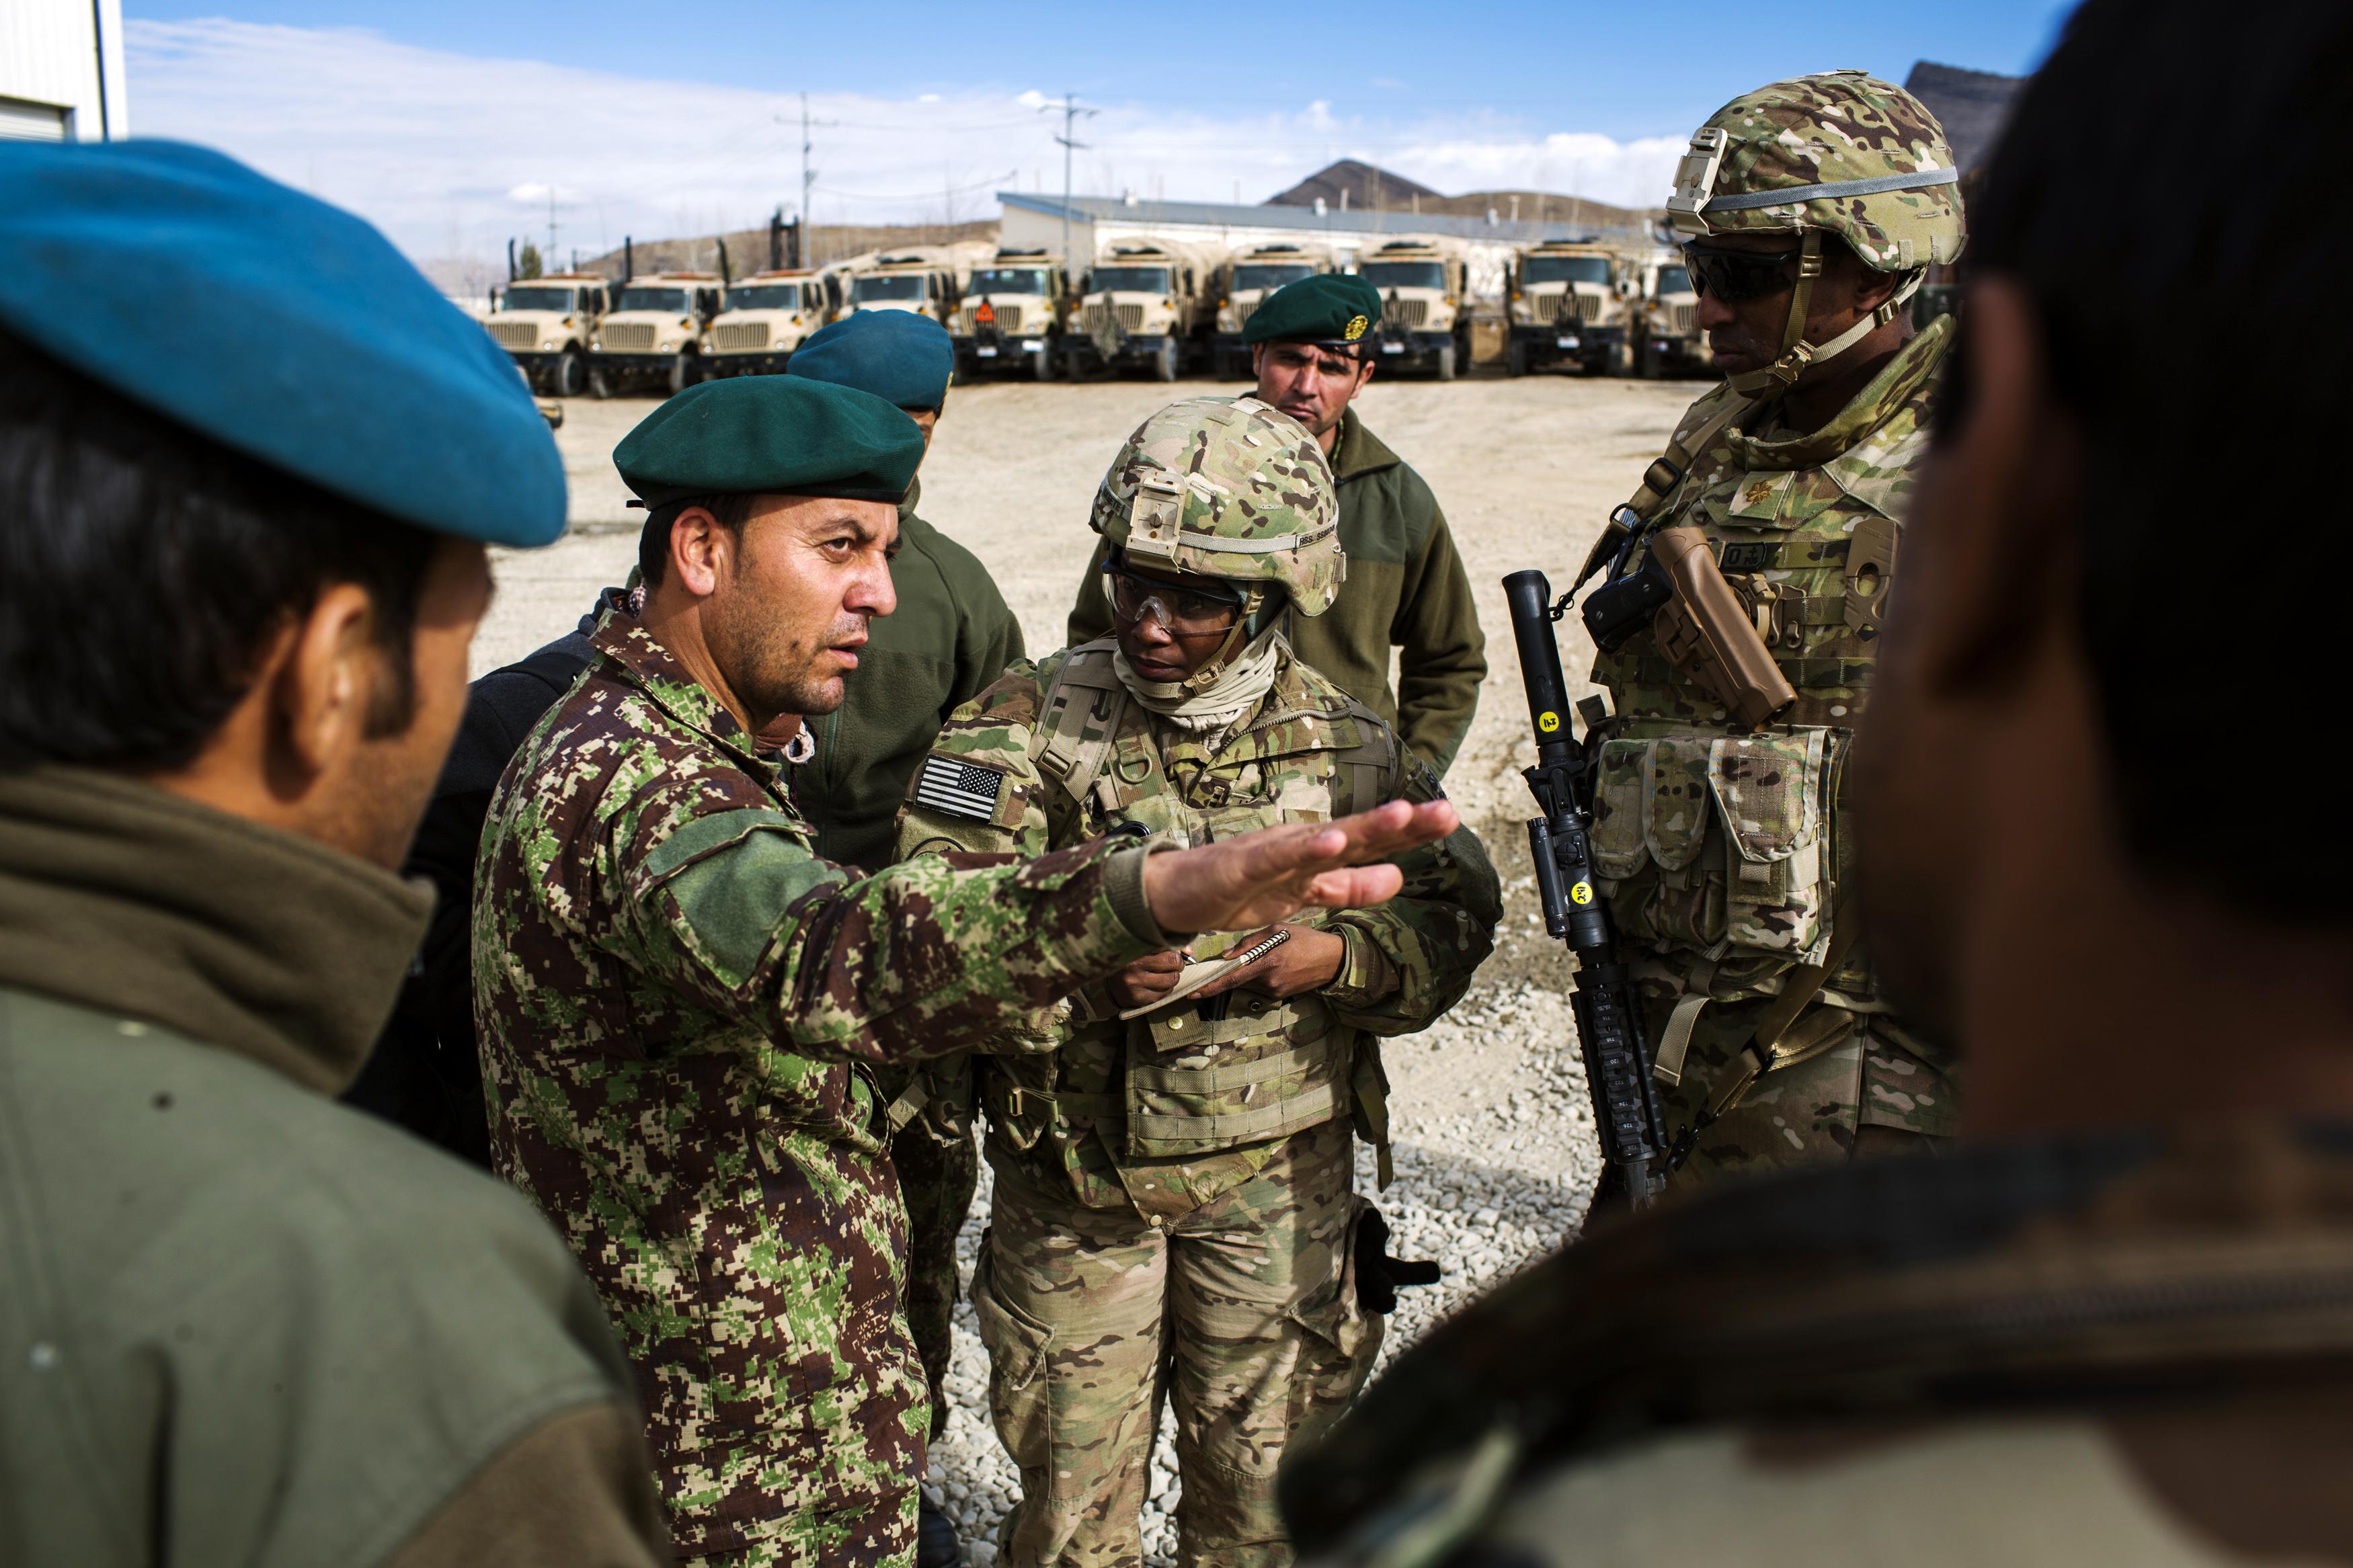 education in afghanistan essay